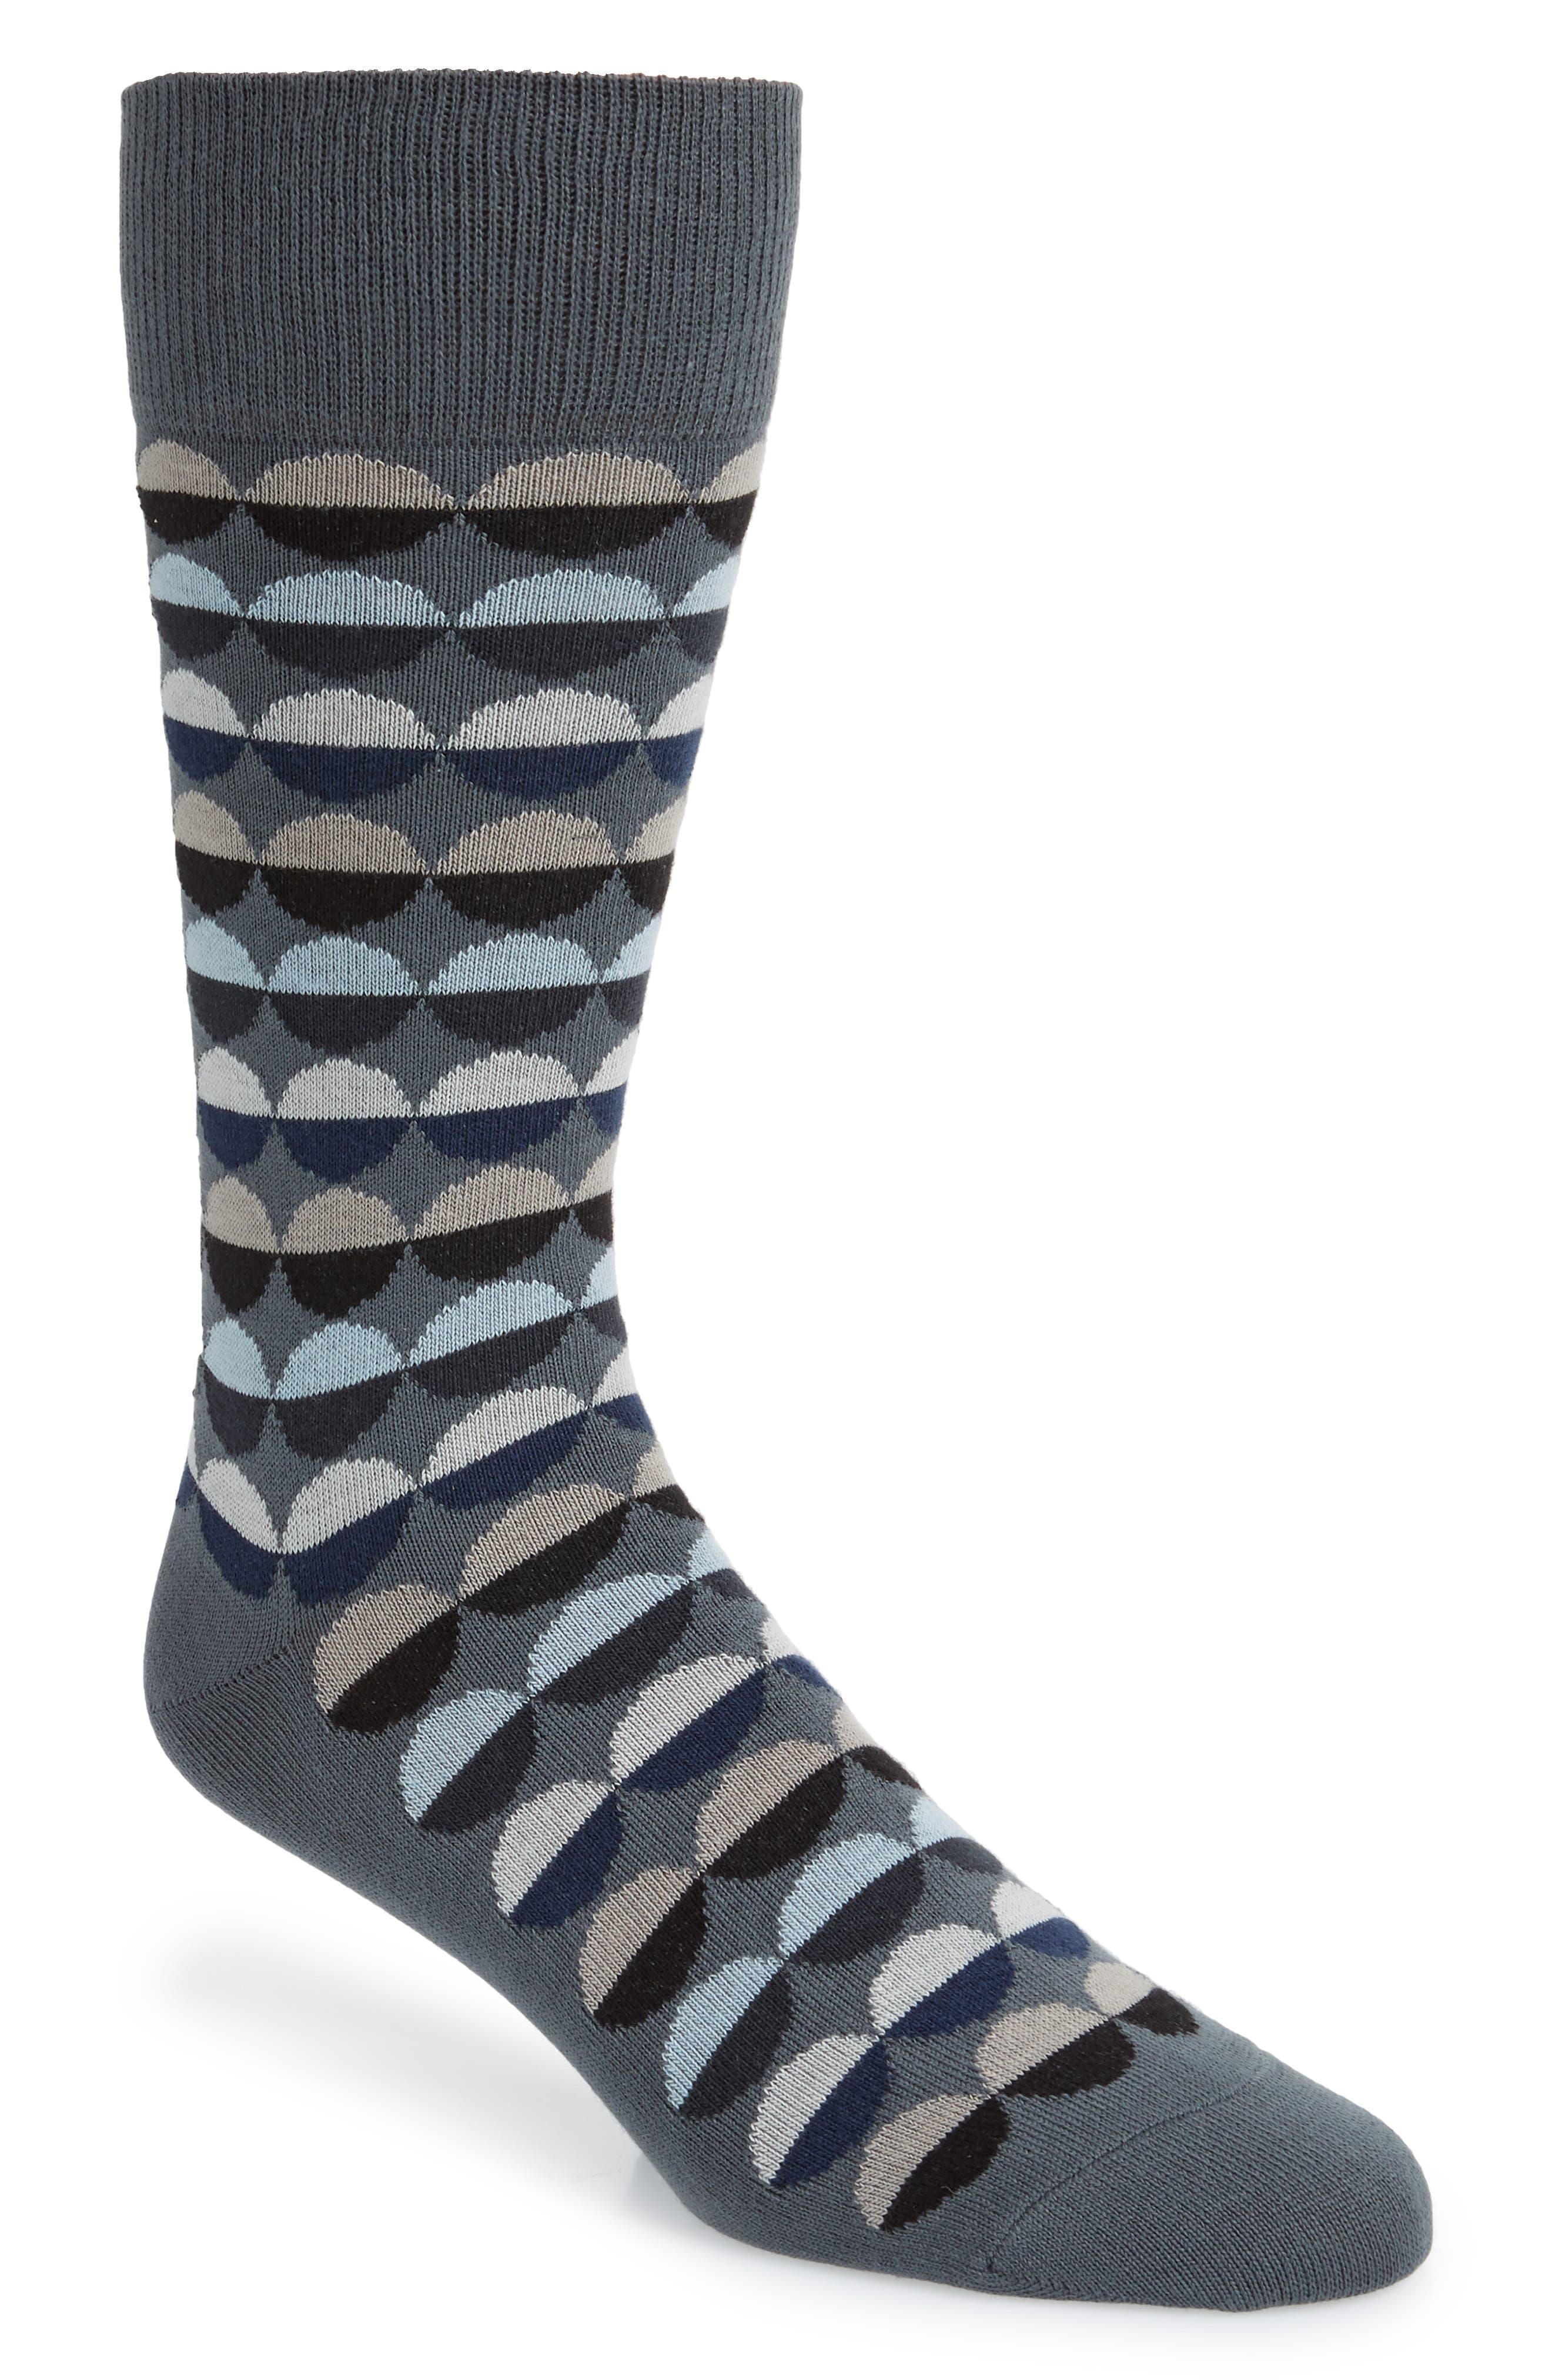 PAUL SMITH Sunset Dot Socks, Main, color, 300